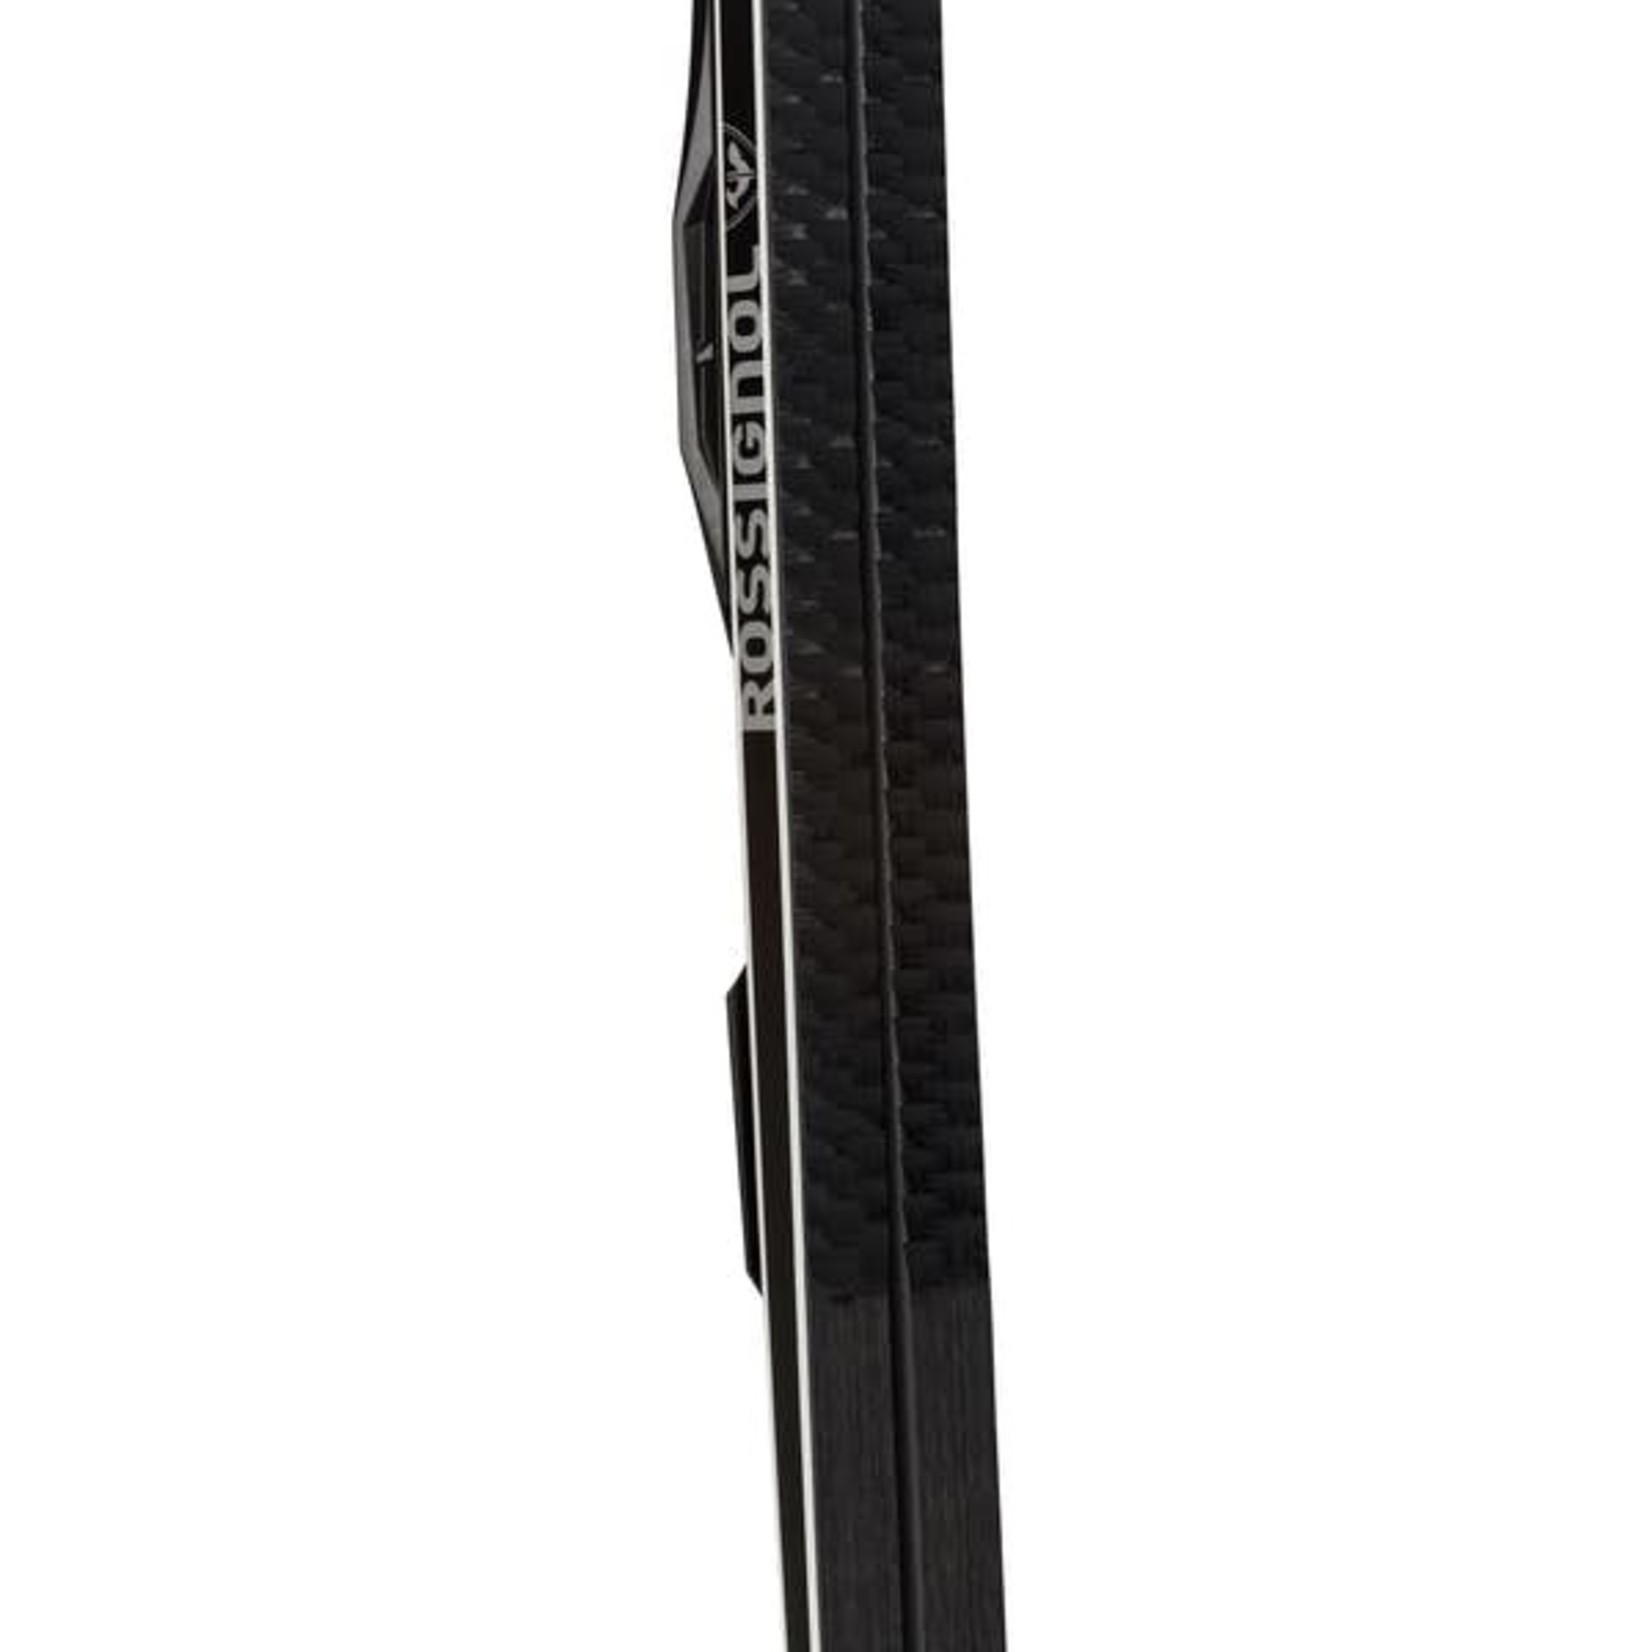 Rossignol Ski de Fond Rossignol Evo XT 50